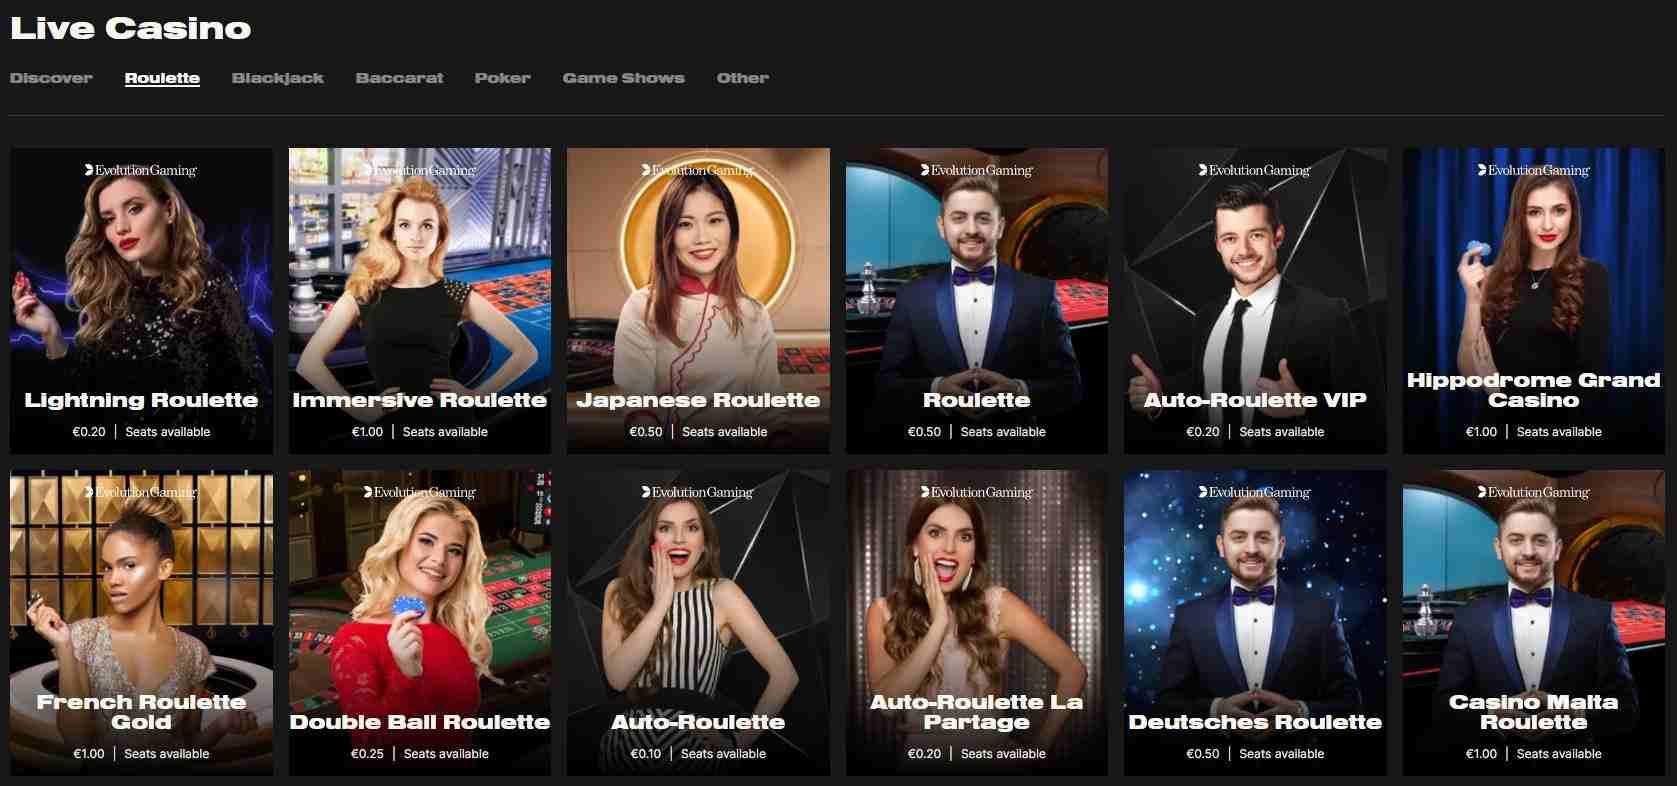 No Limits Casino live games page